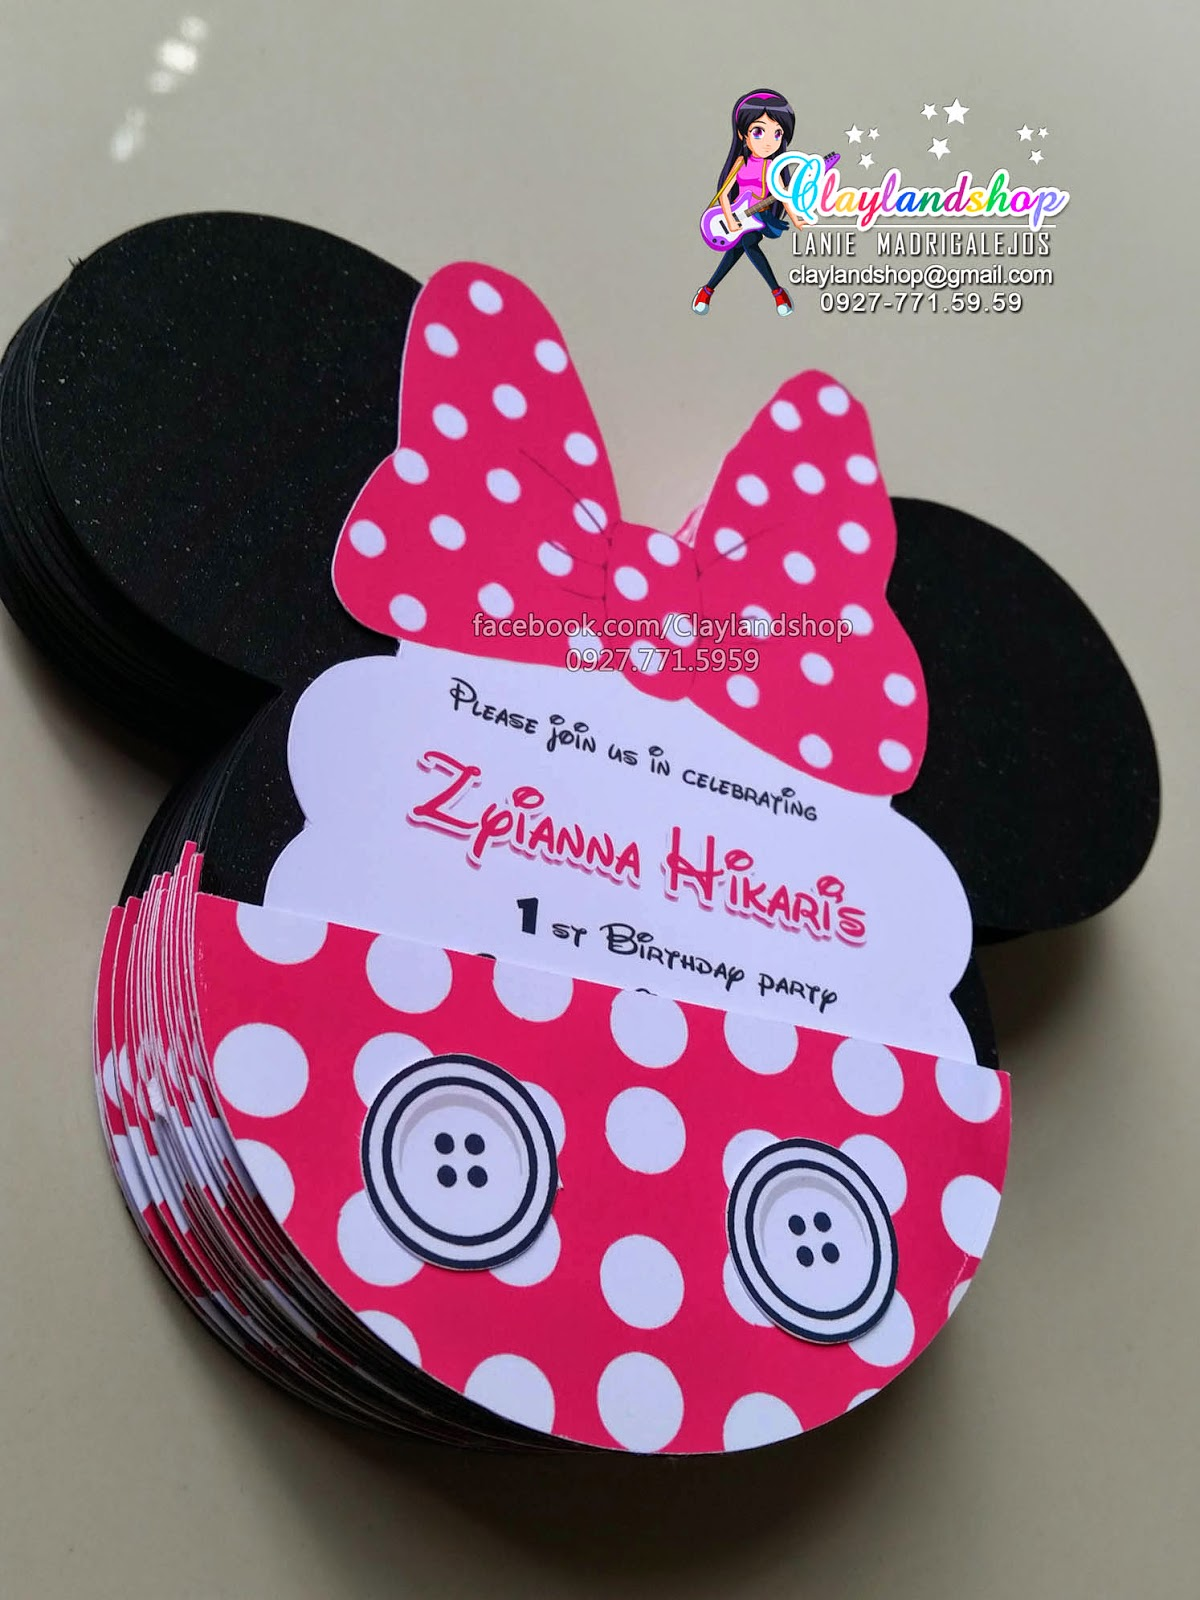 Clayland Souvenir Shop Zyianna Minnie Mouse Invitation